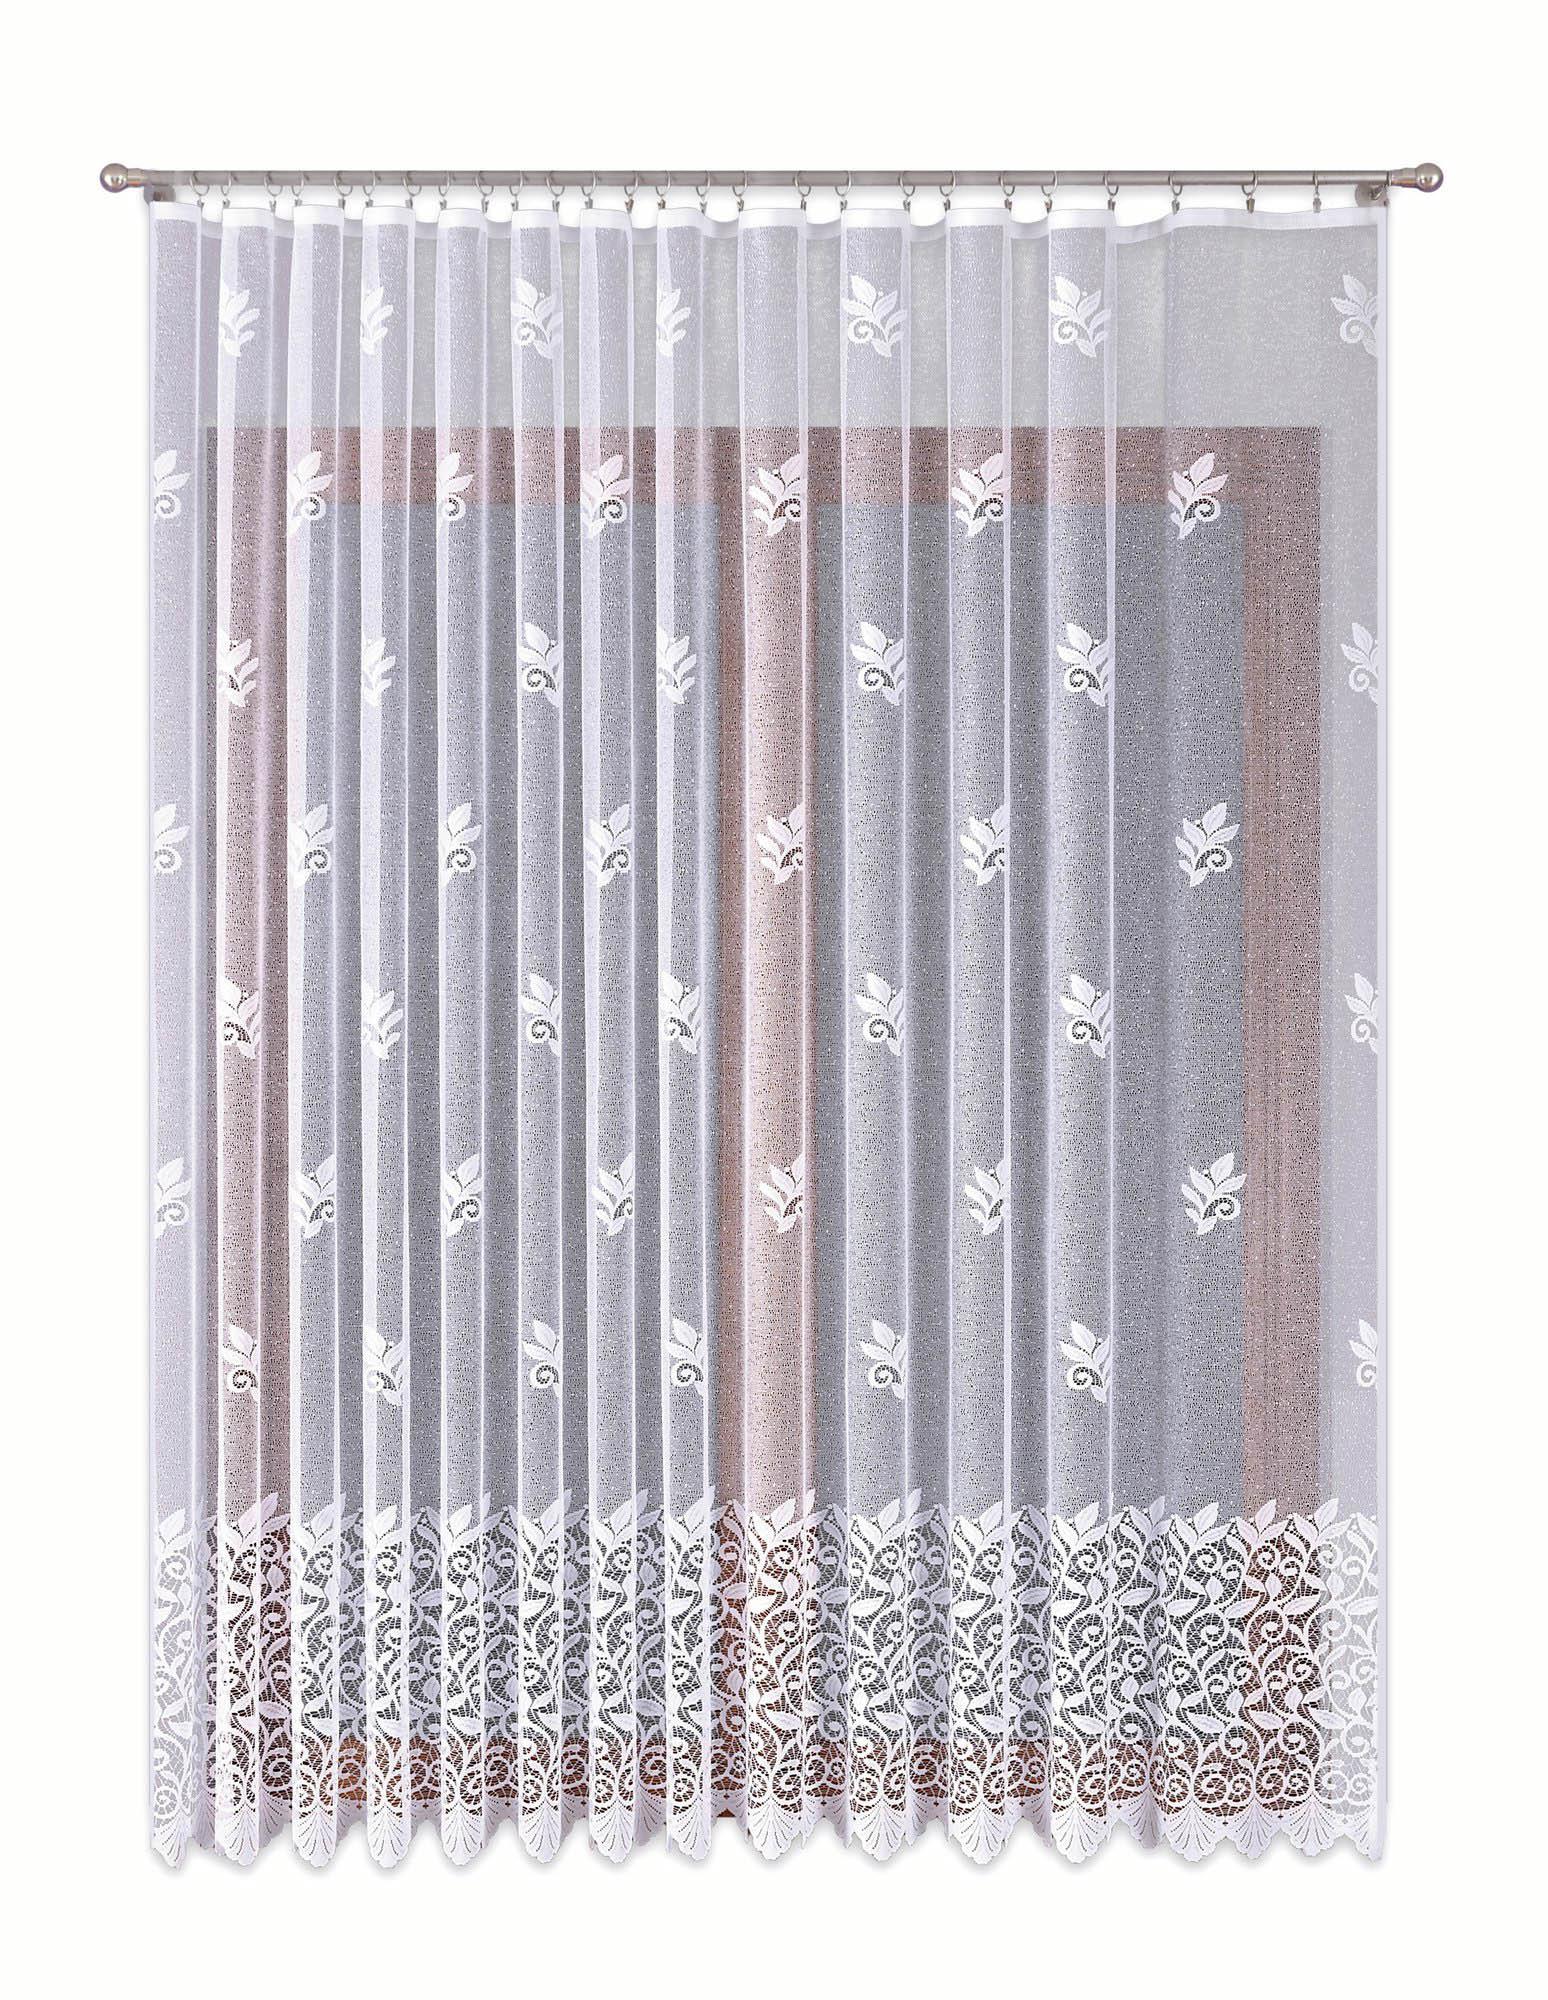 Шторы Primavera Классические шторы Daye Цвет: Белый шторы primavera классические шторы larry цвет белый